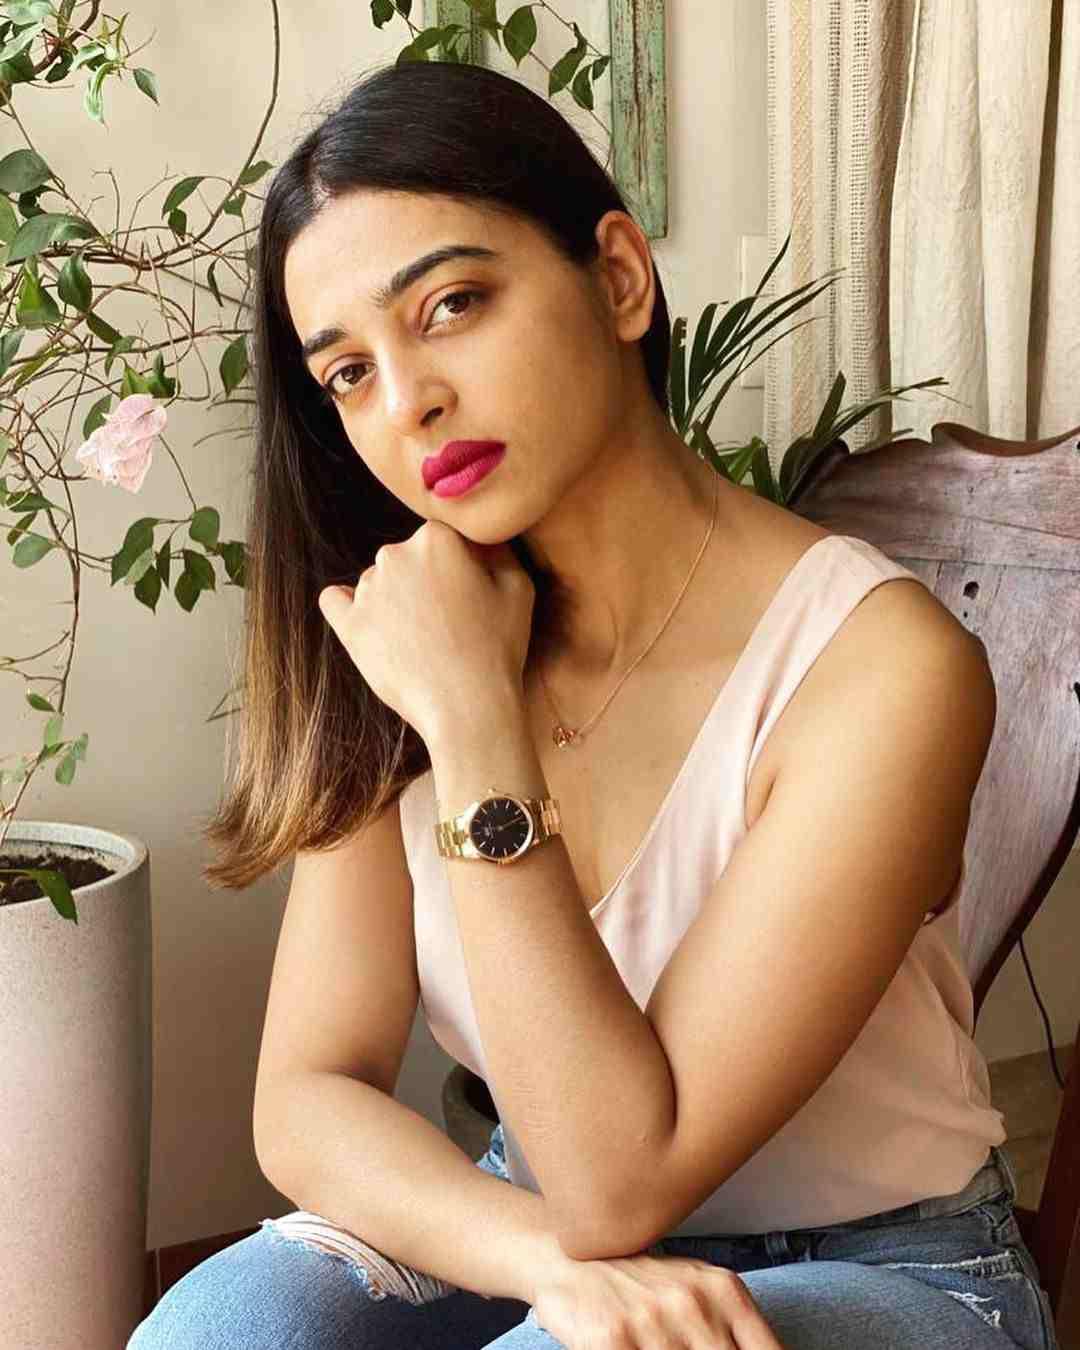 Web Series Actress Radhika Apte Instagram Photos